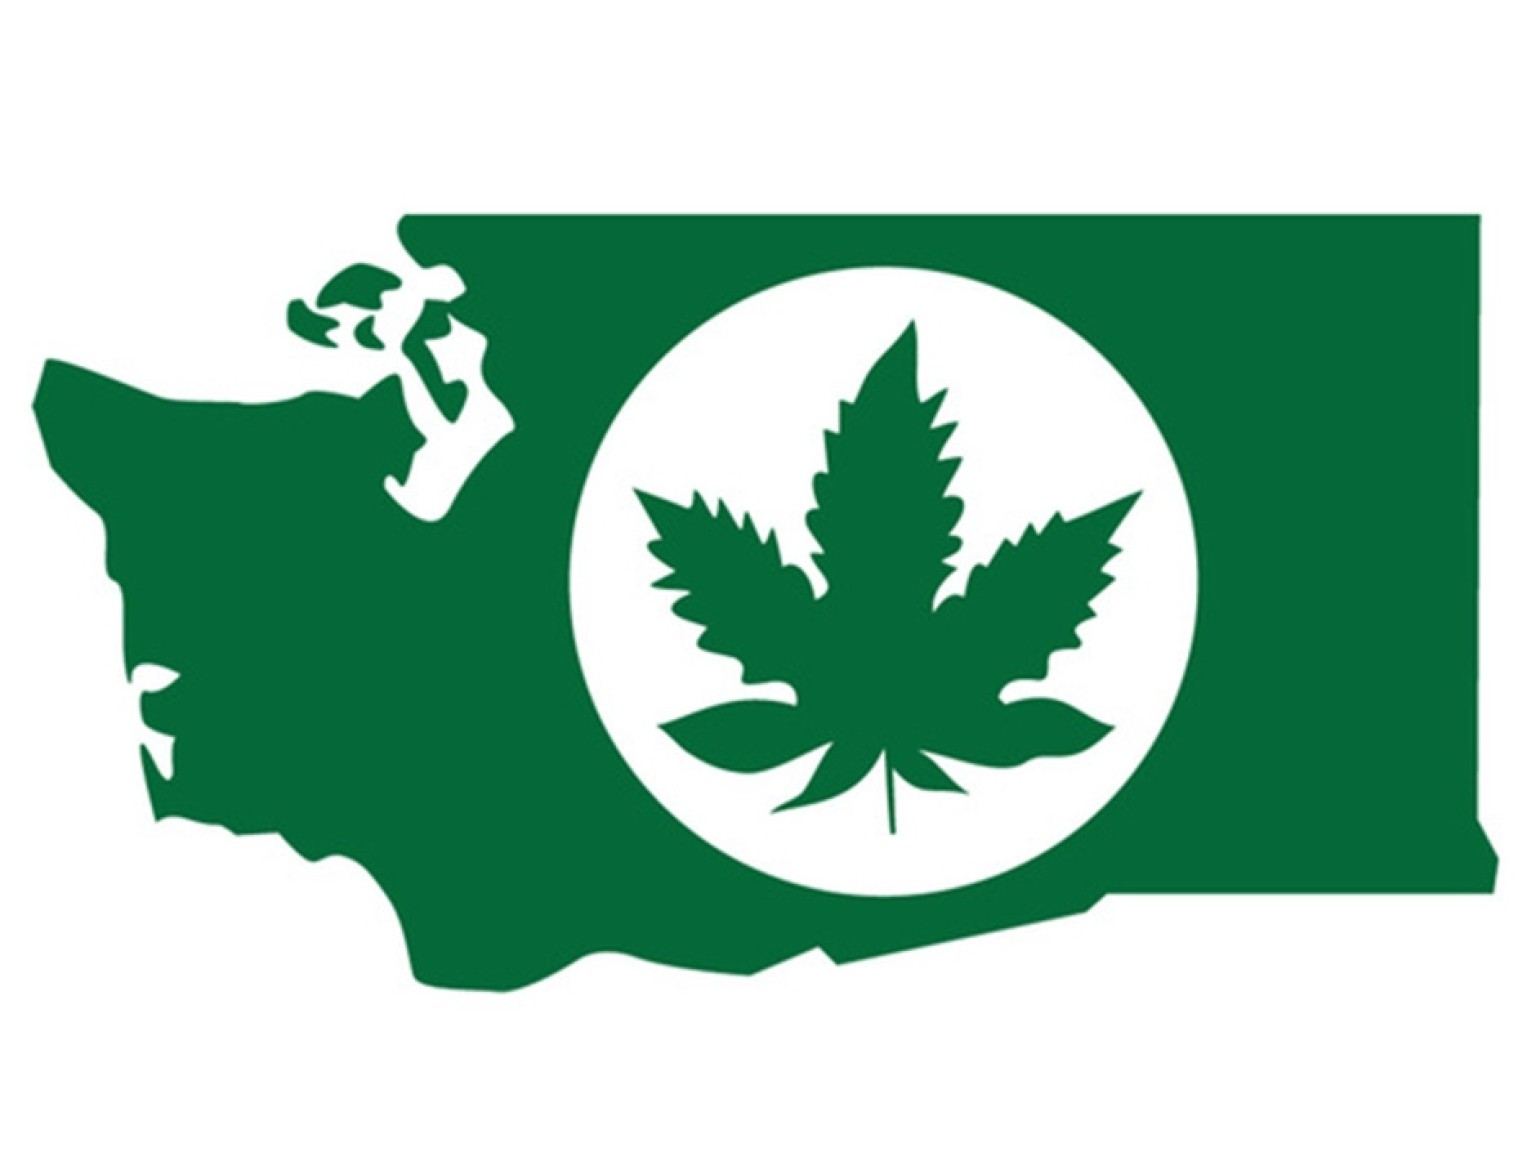 washington states marijuana logo nixed as too weed